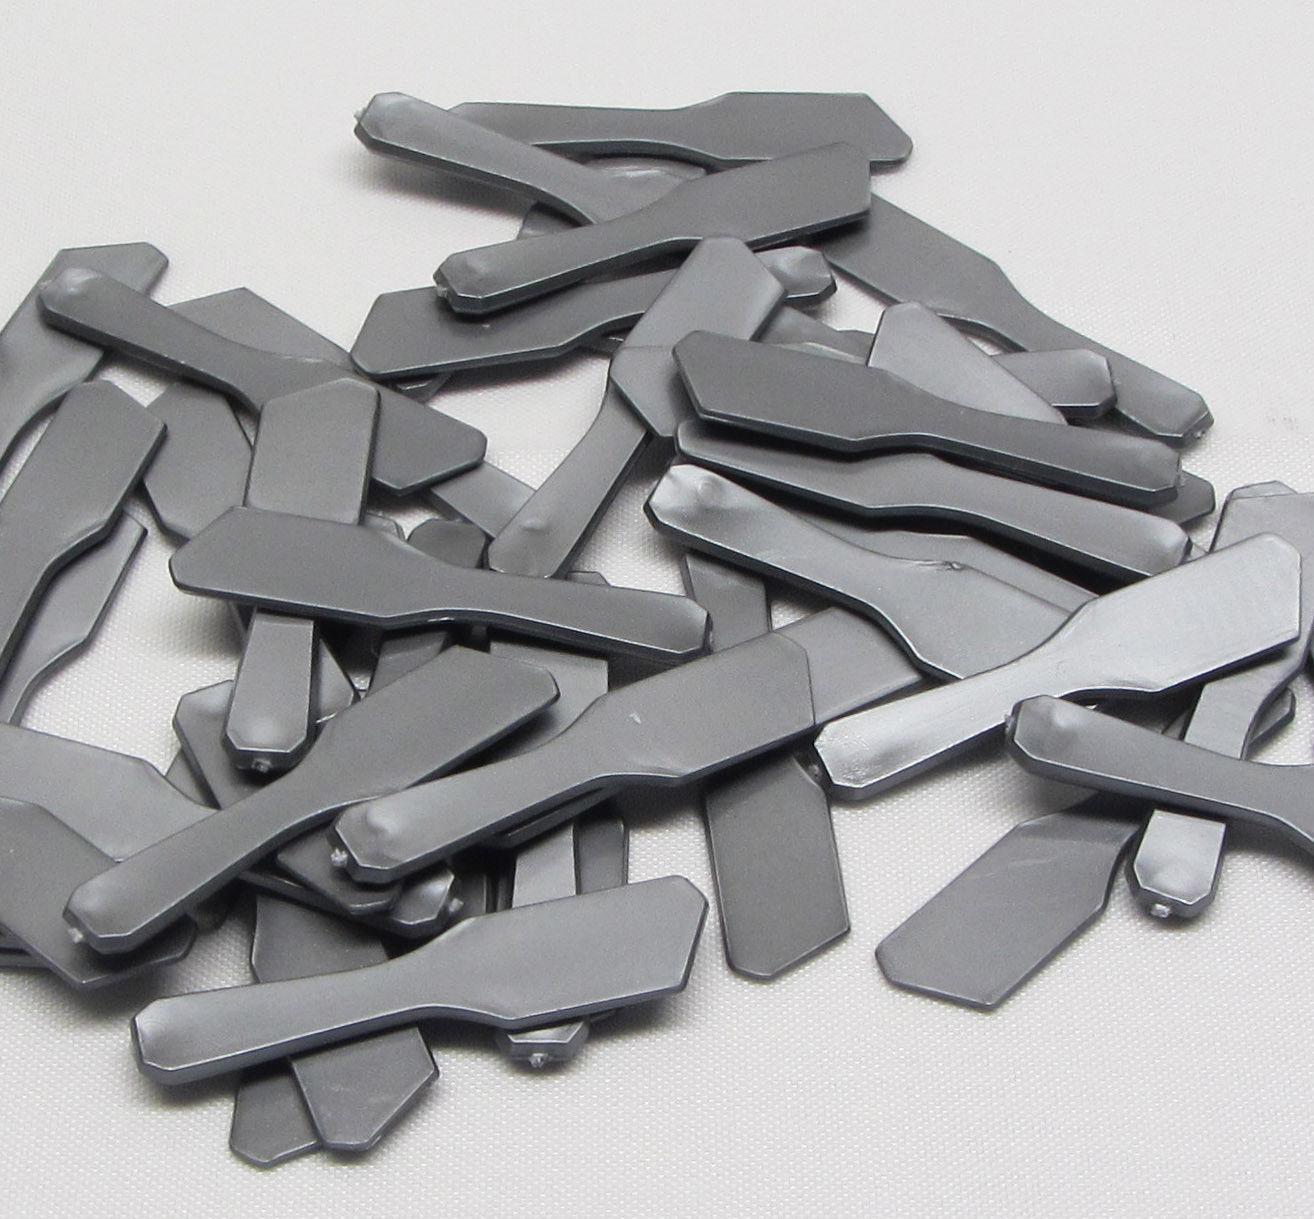 200 Cosmetic Mini Spatulas Makeup Mixing Tool Silver Grey Plastic Scraper #5002